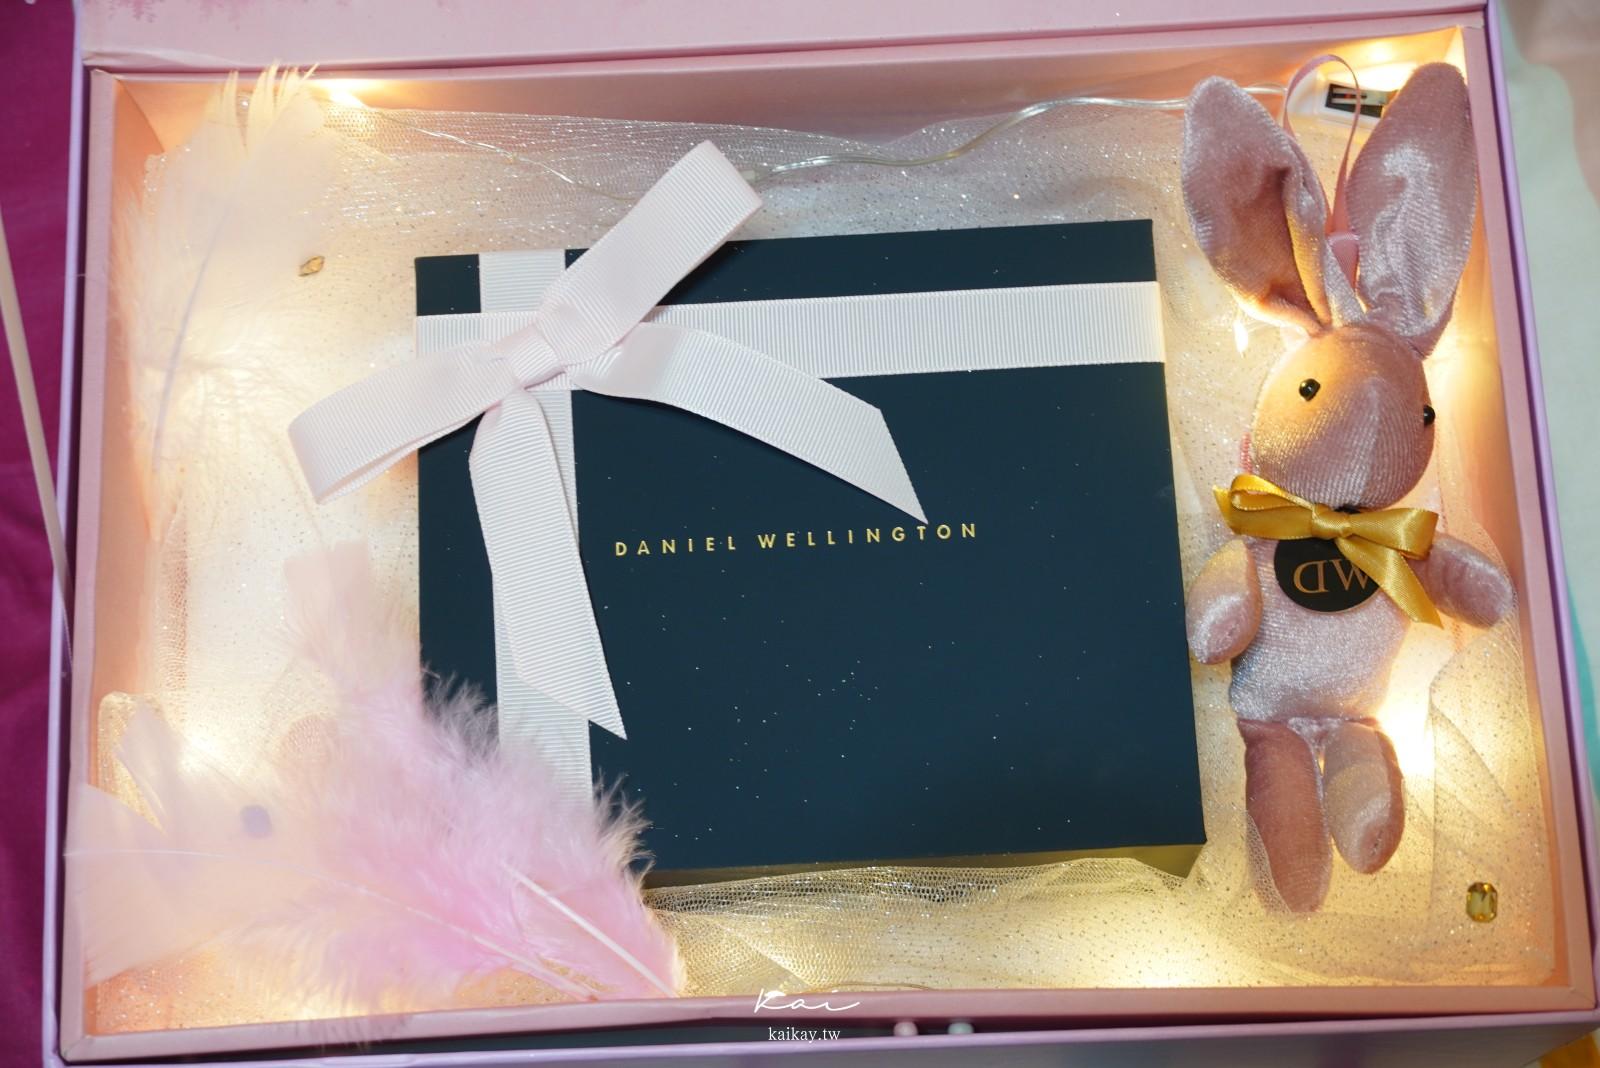 ☆【DW折扣碼】Daniel Wellington ICONIC LINK聖經女神錶。2021折扣碼:kaikay